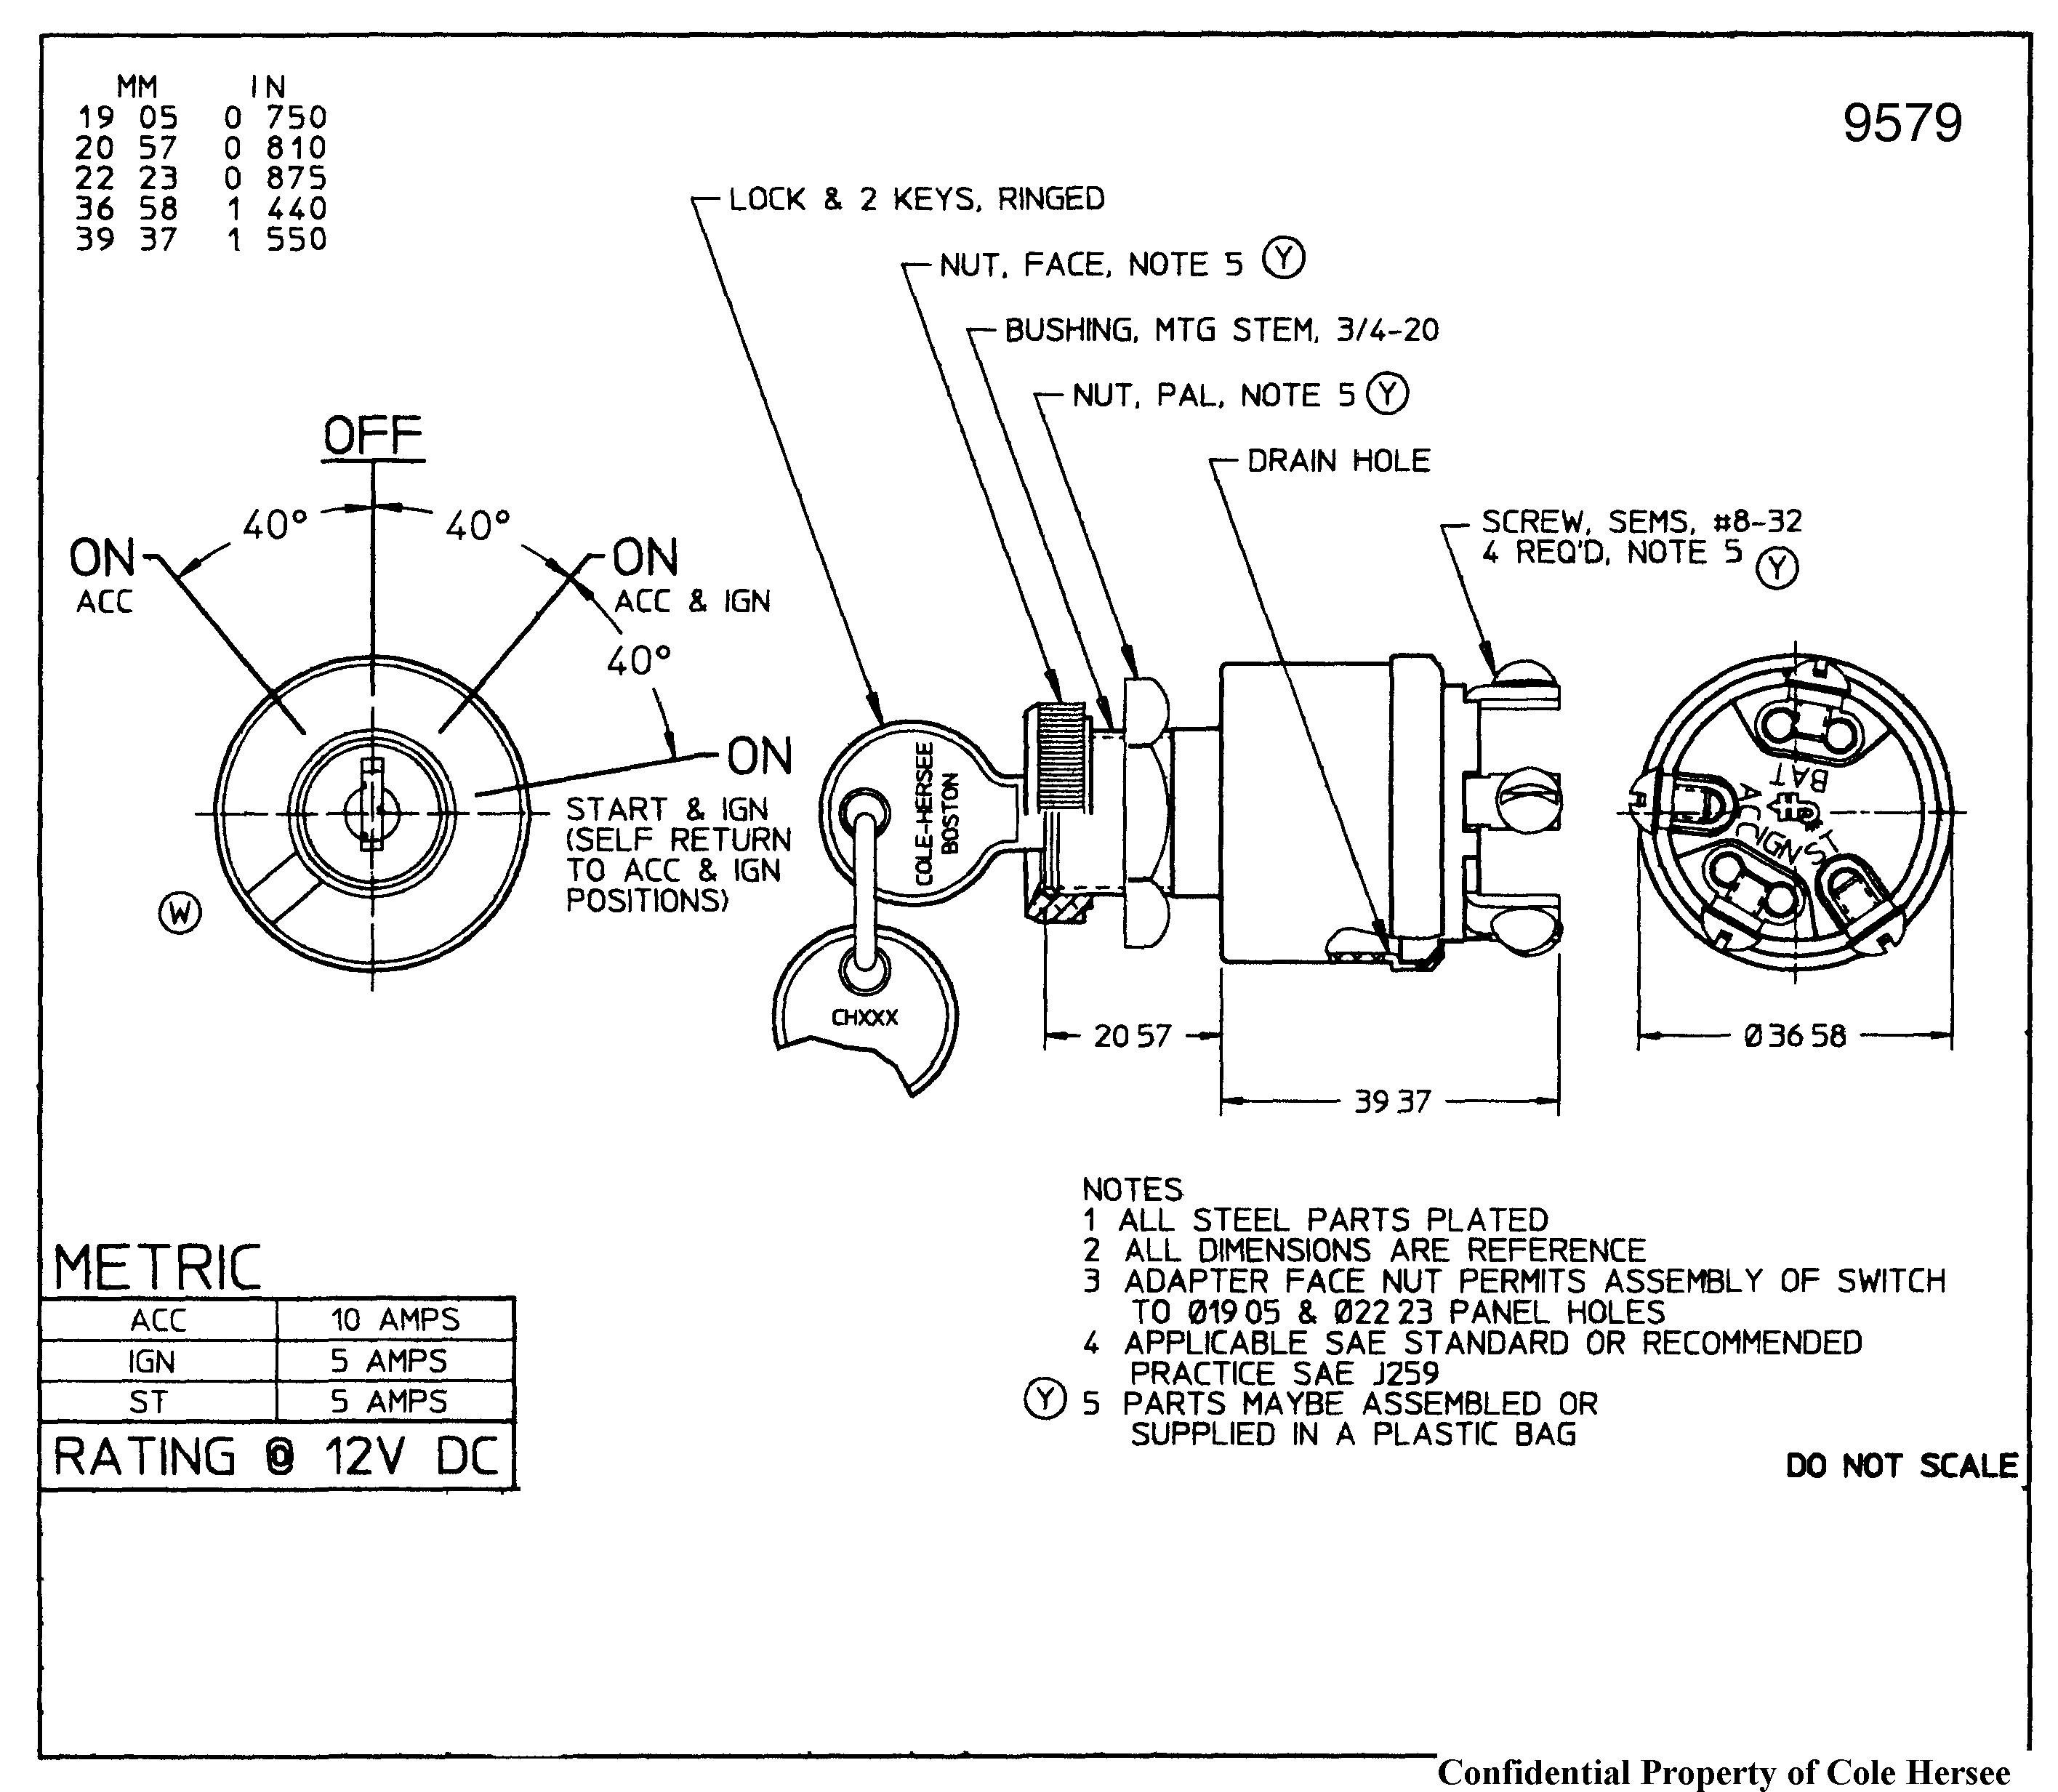 Kohler Engine Ignition Wiring Diagram 50 Fresh Kohler Ignition ...